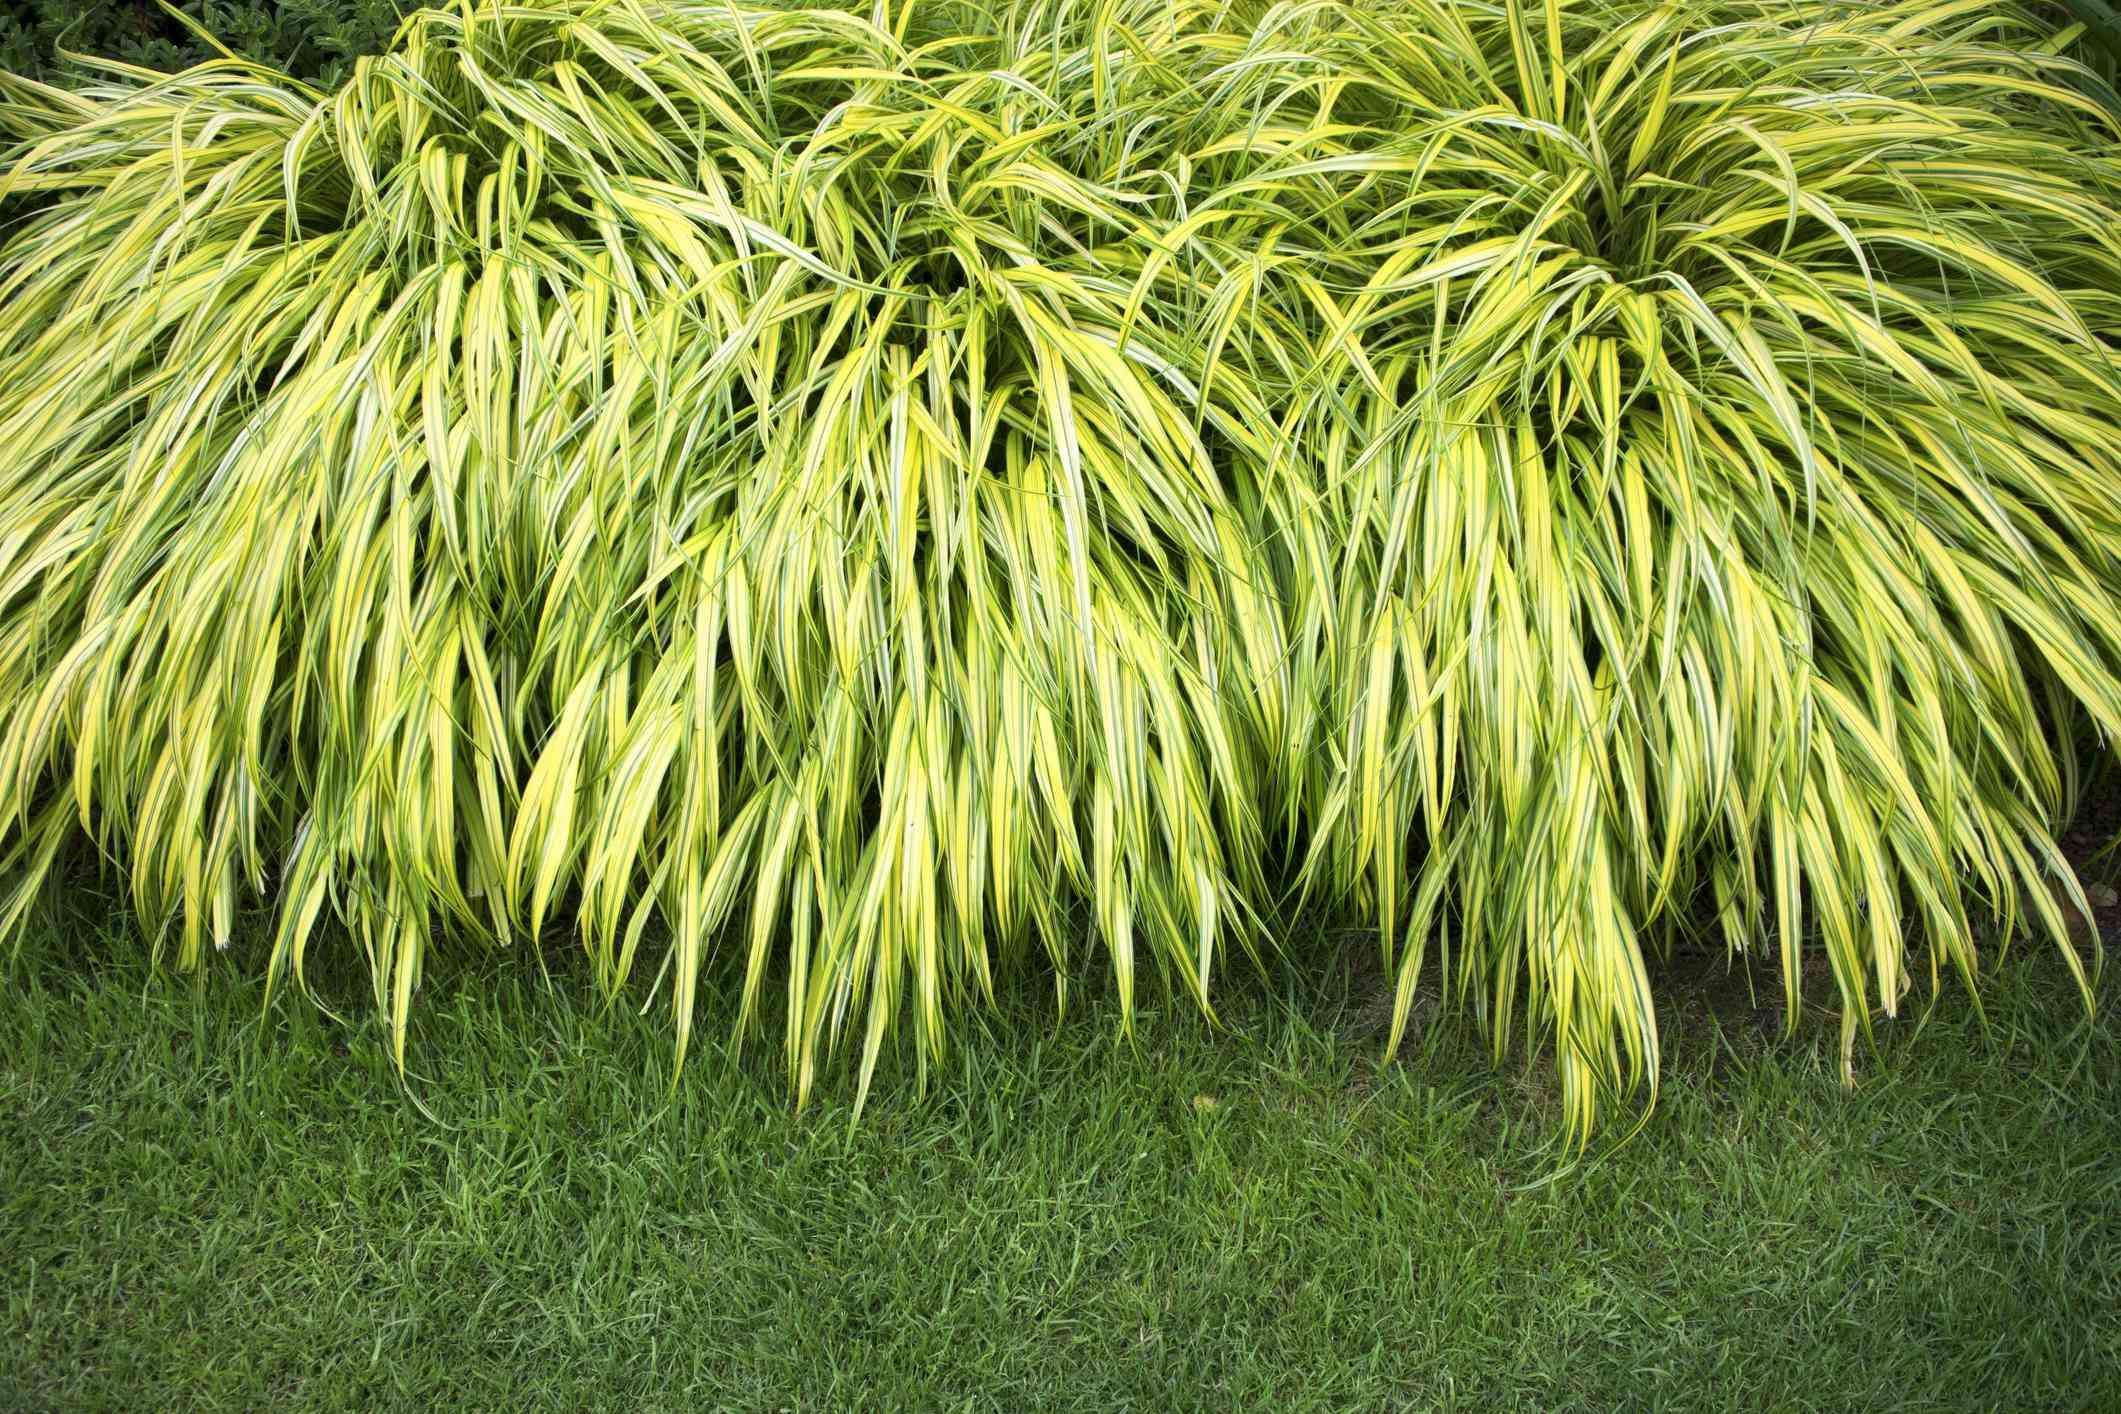 Hakonechloa macra Aureola or Bunchgrass